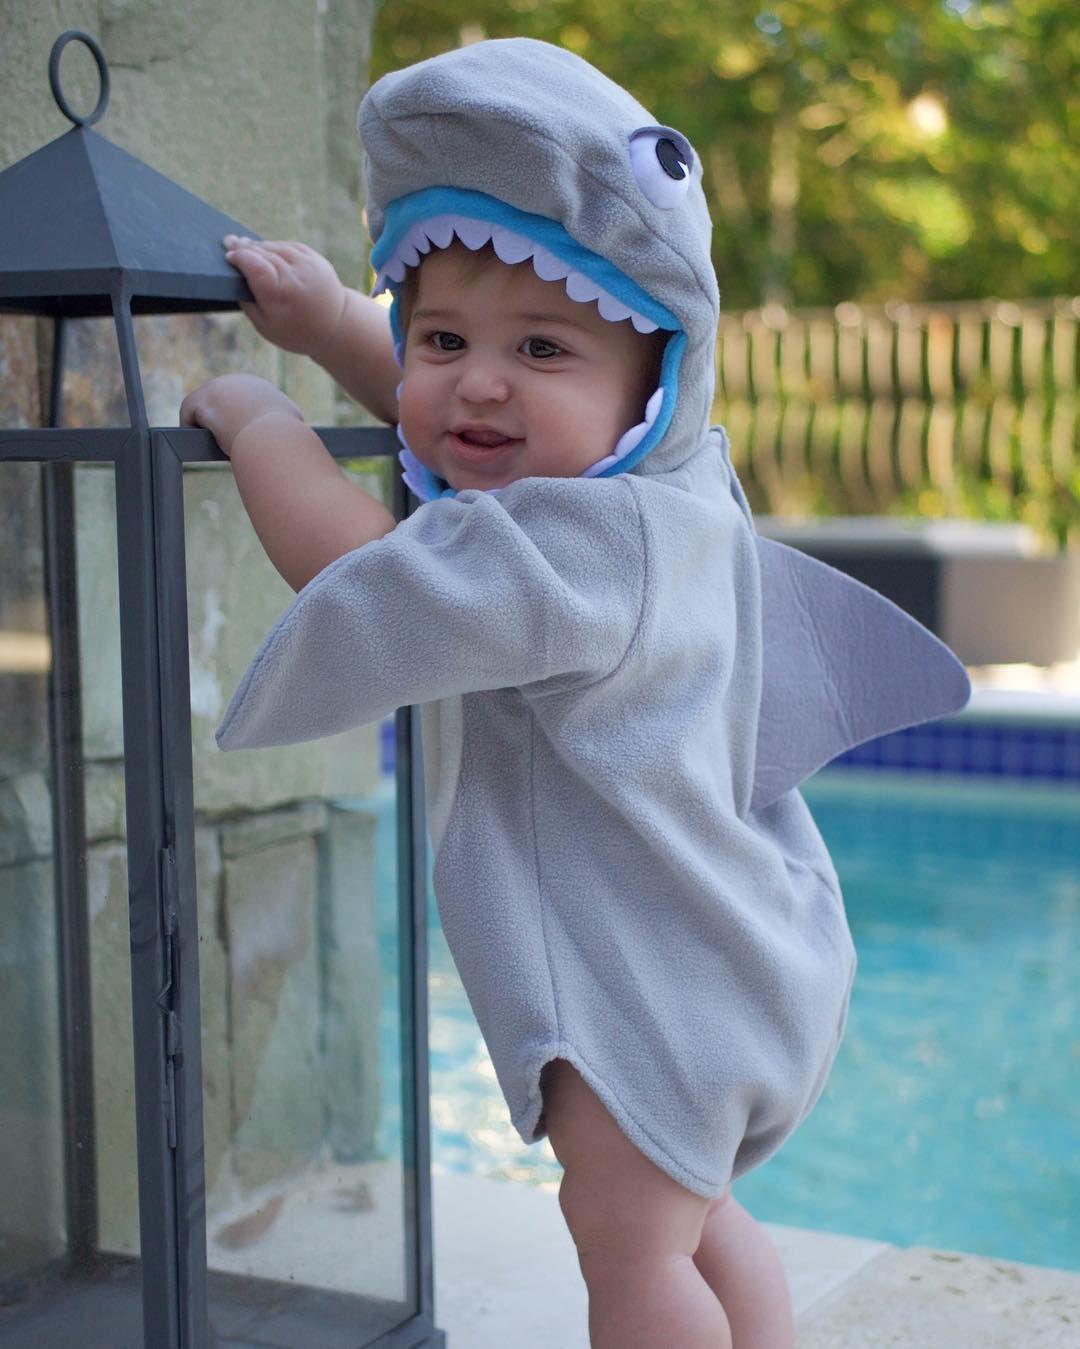 Pottery barn kids, baby shark costume, halloween costumes